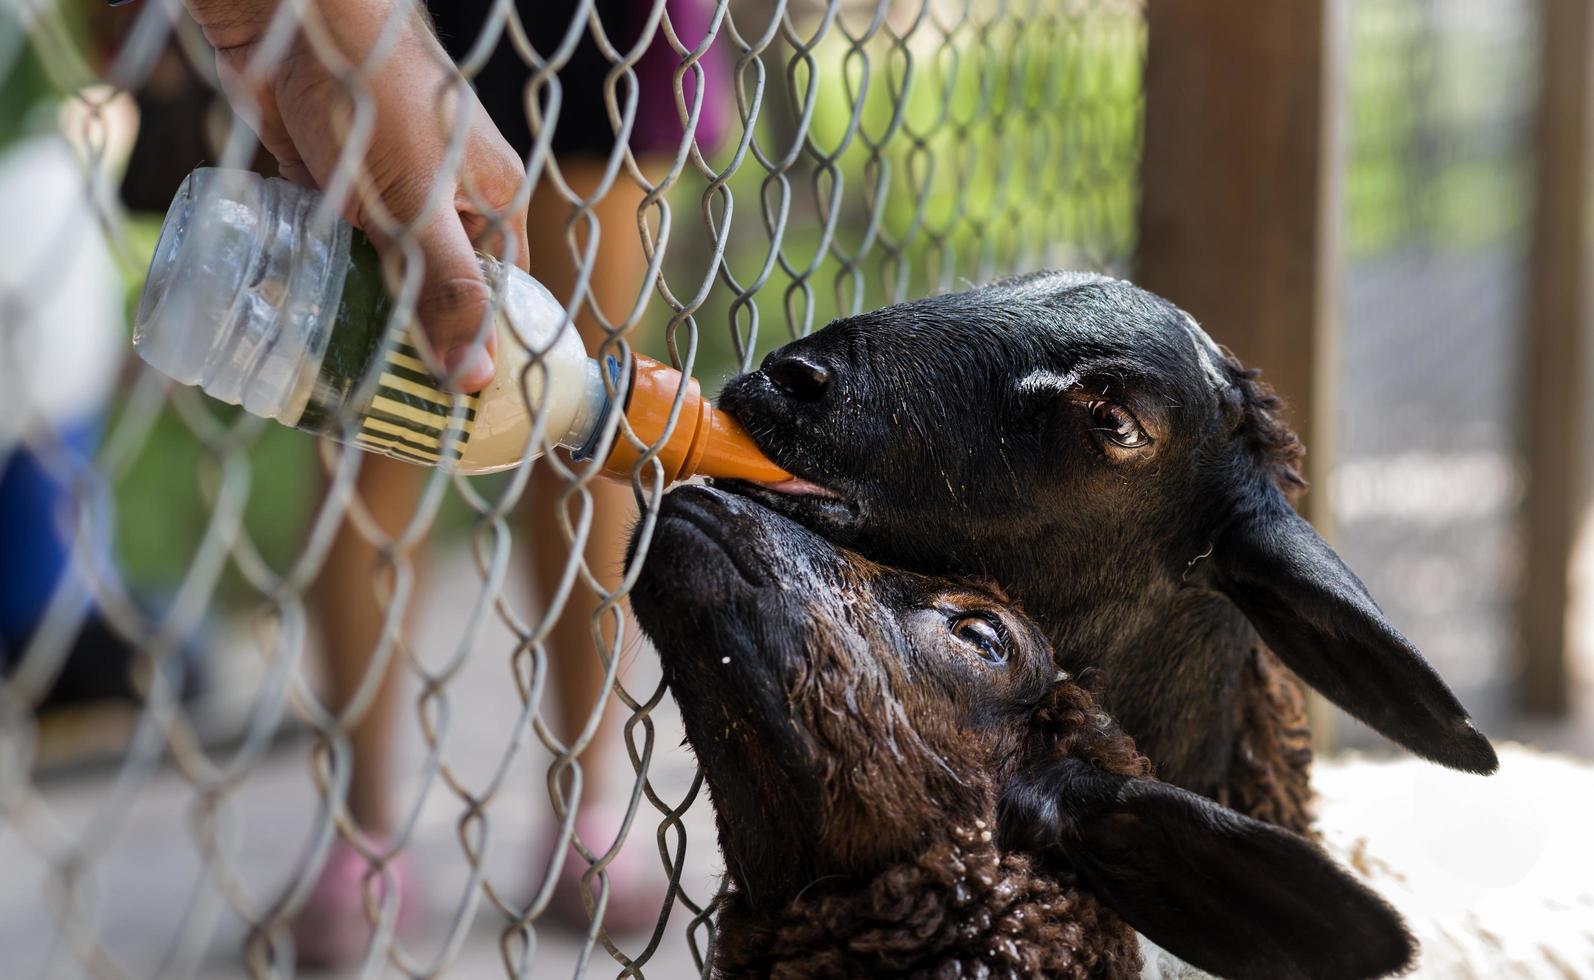 alimentando cabras negras con un biberón de leche foto